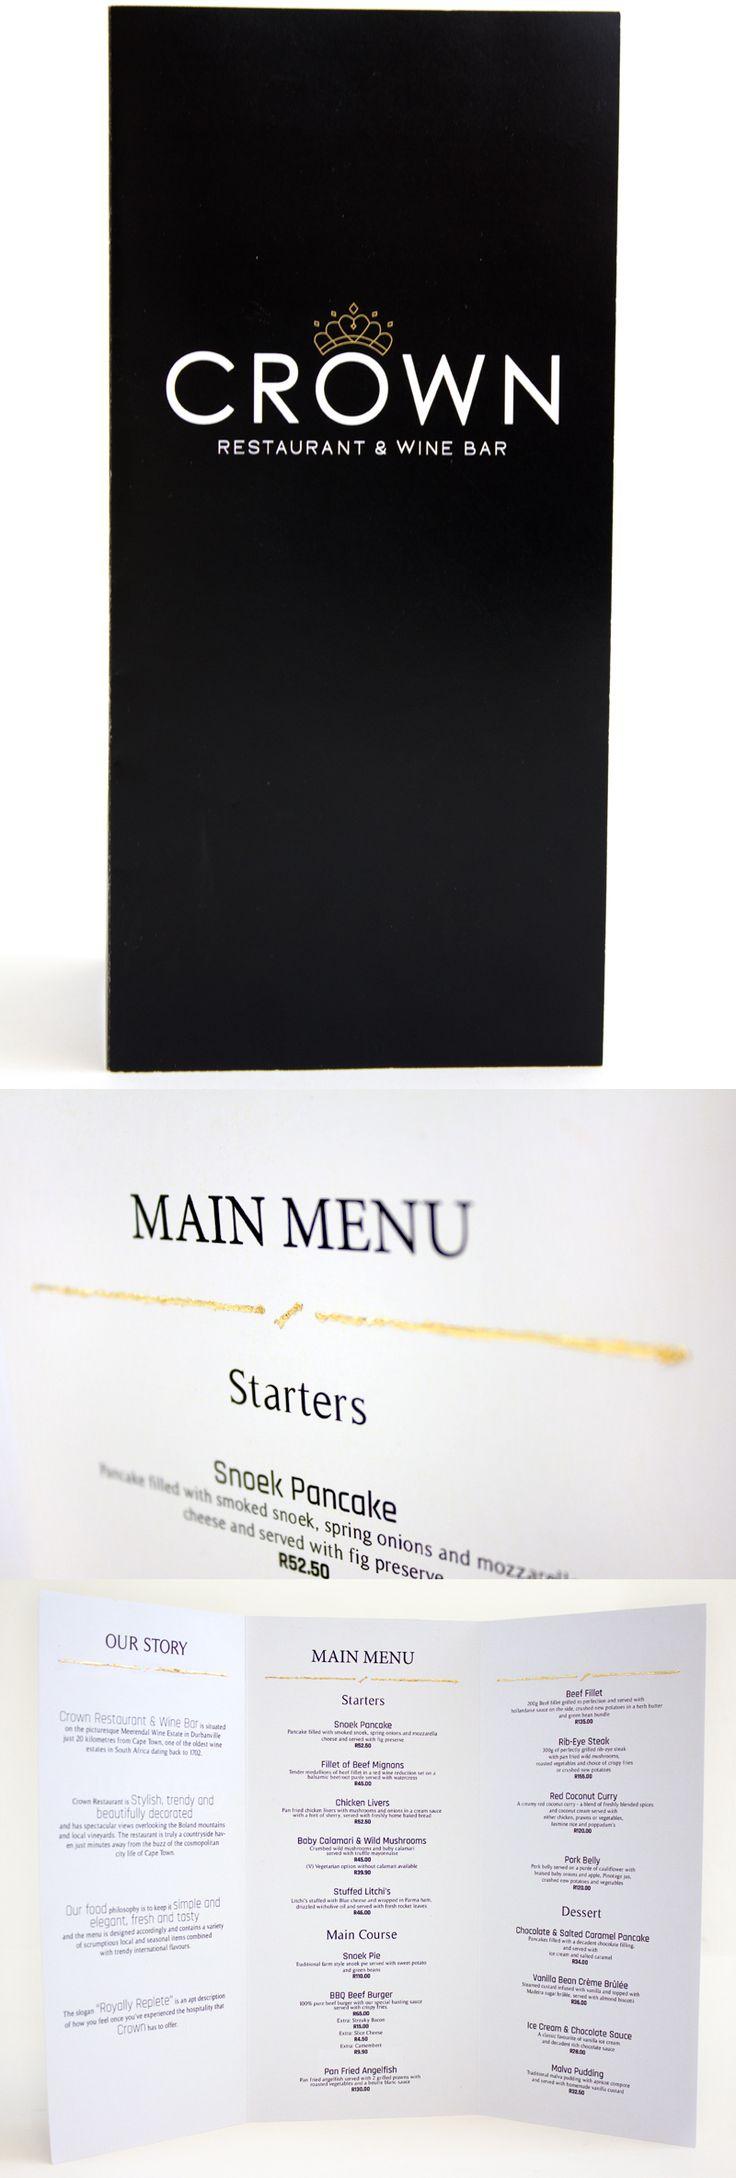 Class: 1 Year Print Design & Publishing || Name: Micke Mouton || Year: 2014 || Recreate your favorite restaurants menu. http://friendsofdesign.net/1-year-print-design-publishing